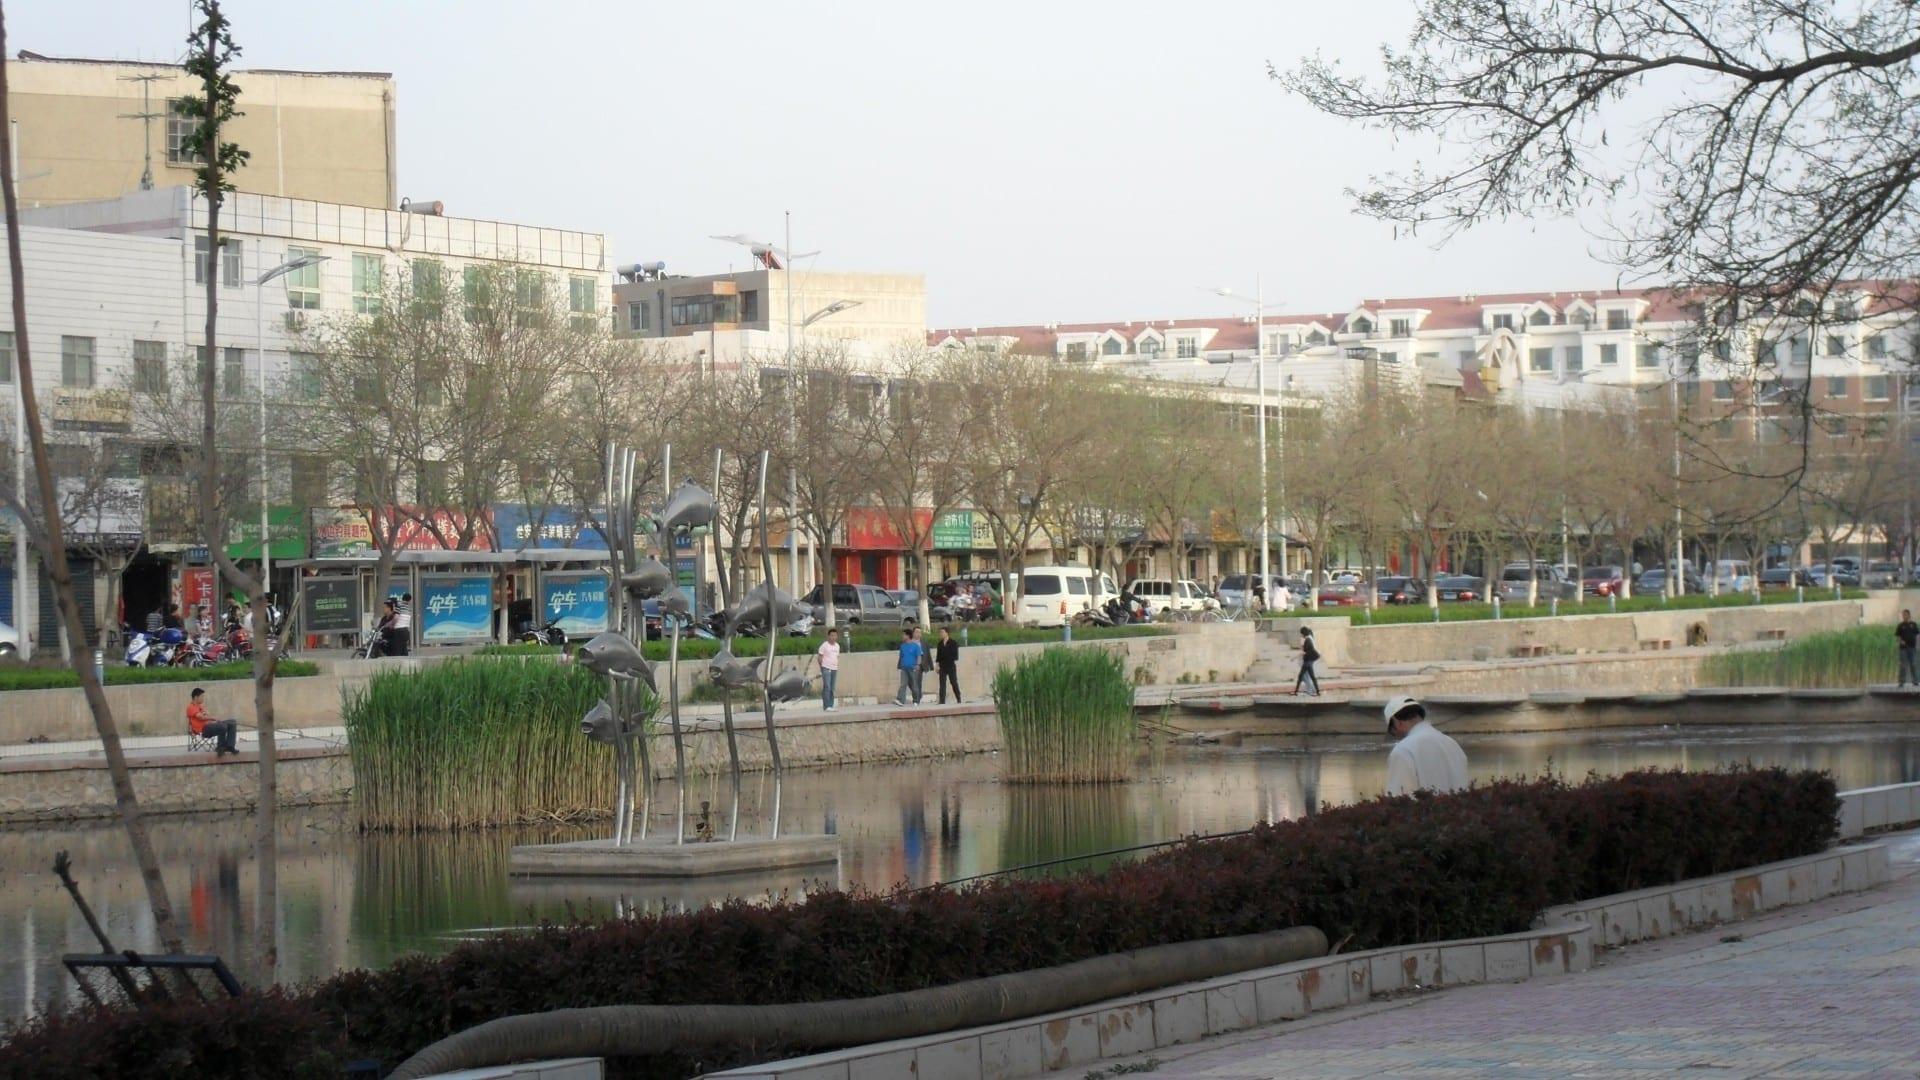 Escena callejera... Yinchuan China